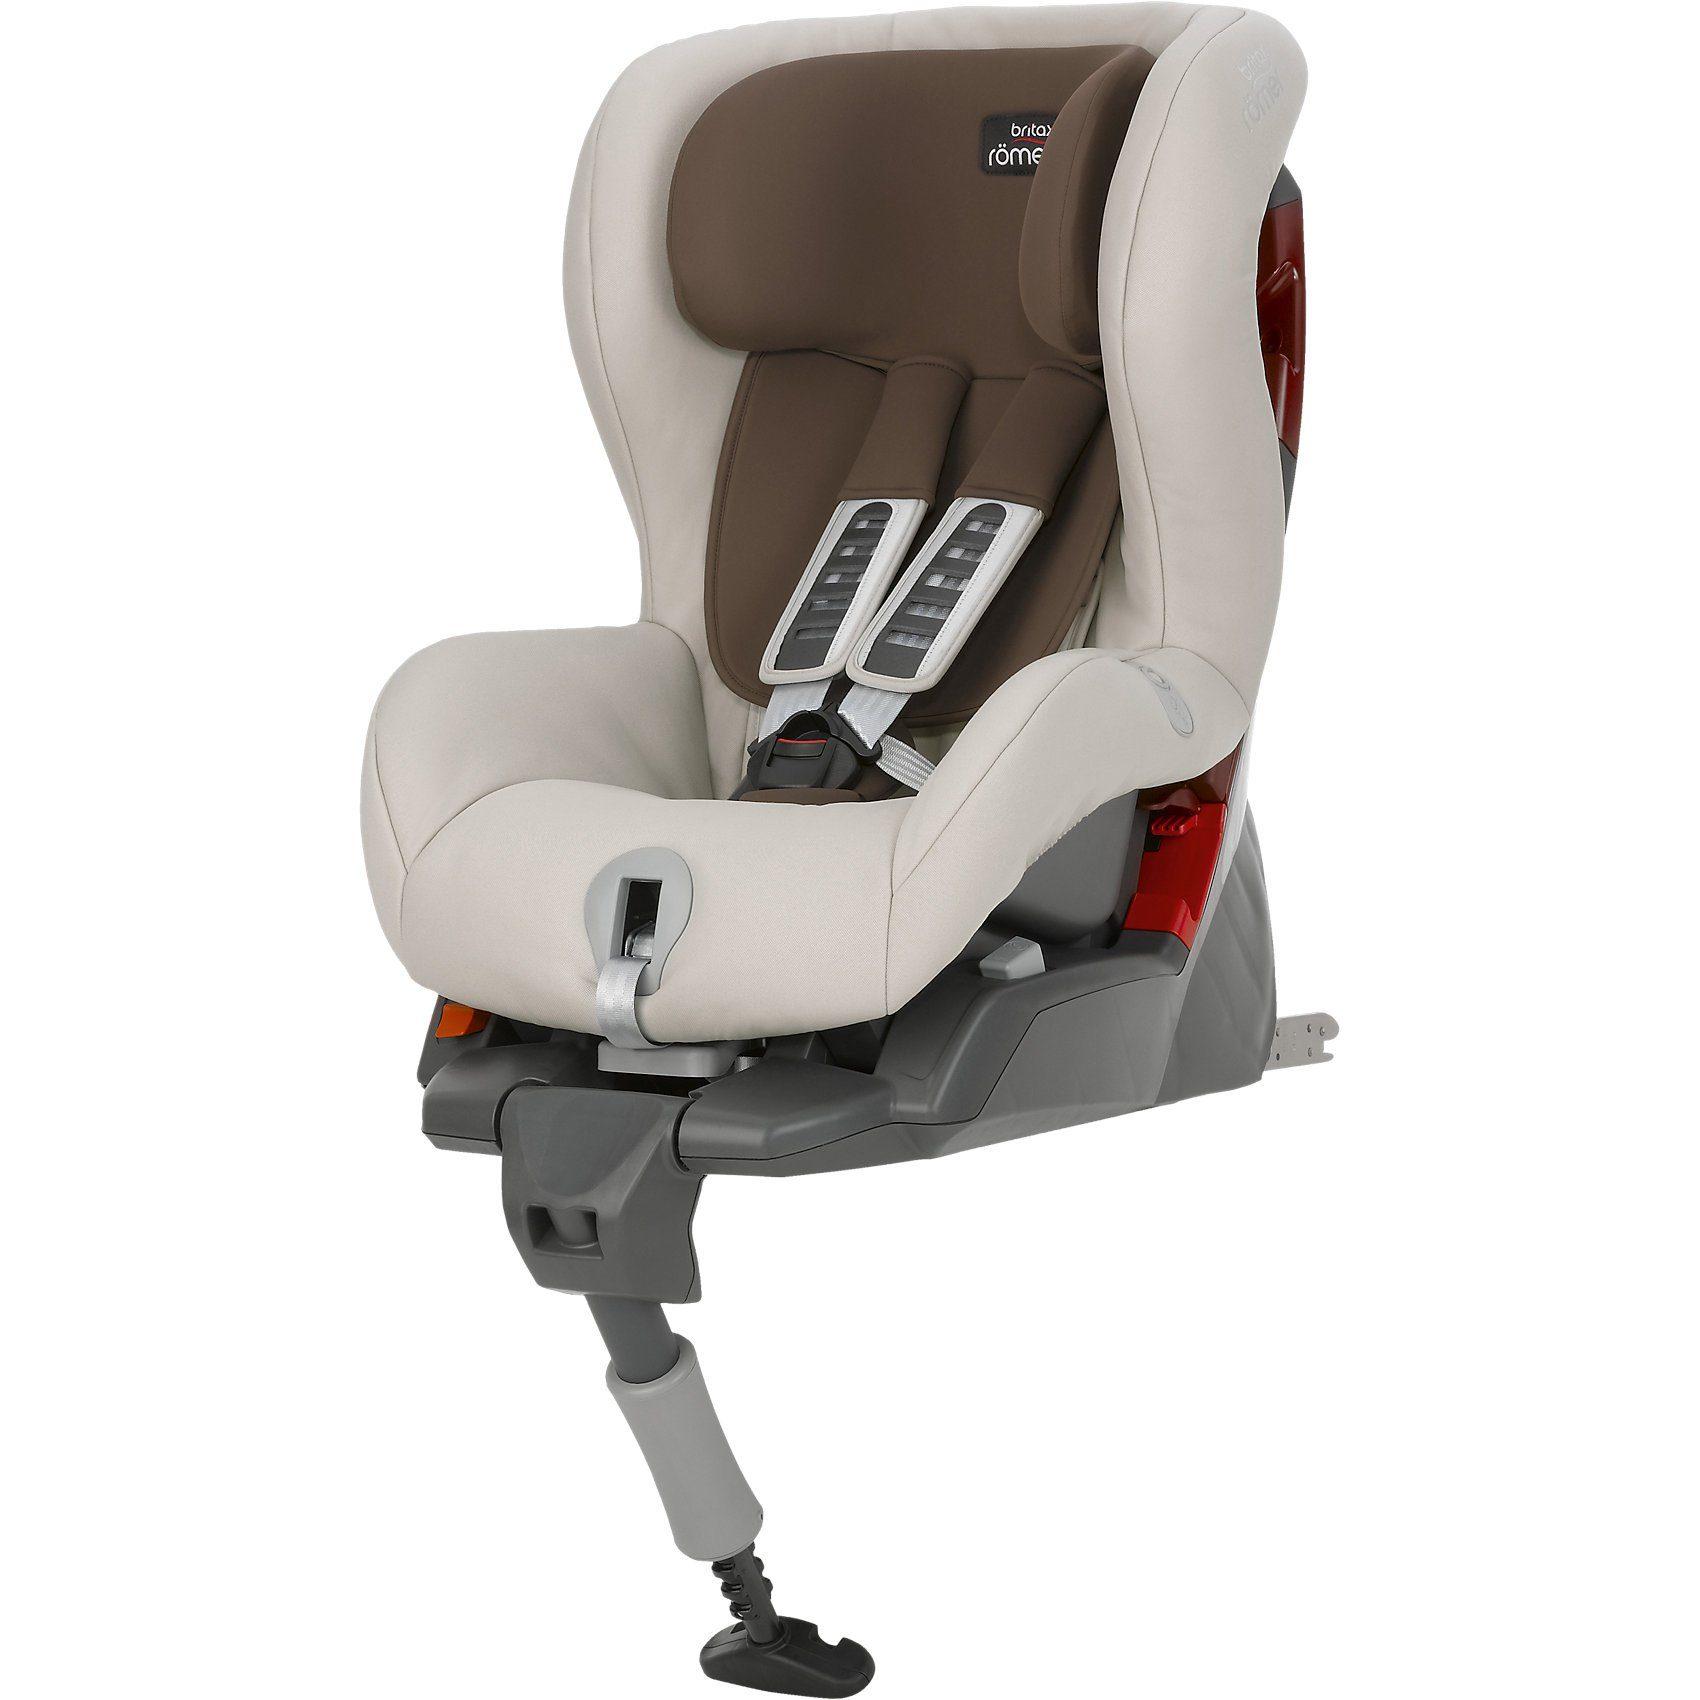 Britax Römer Auto-Kindersitz Safefix Plus, Sand Beige, 2016